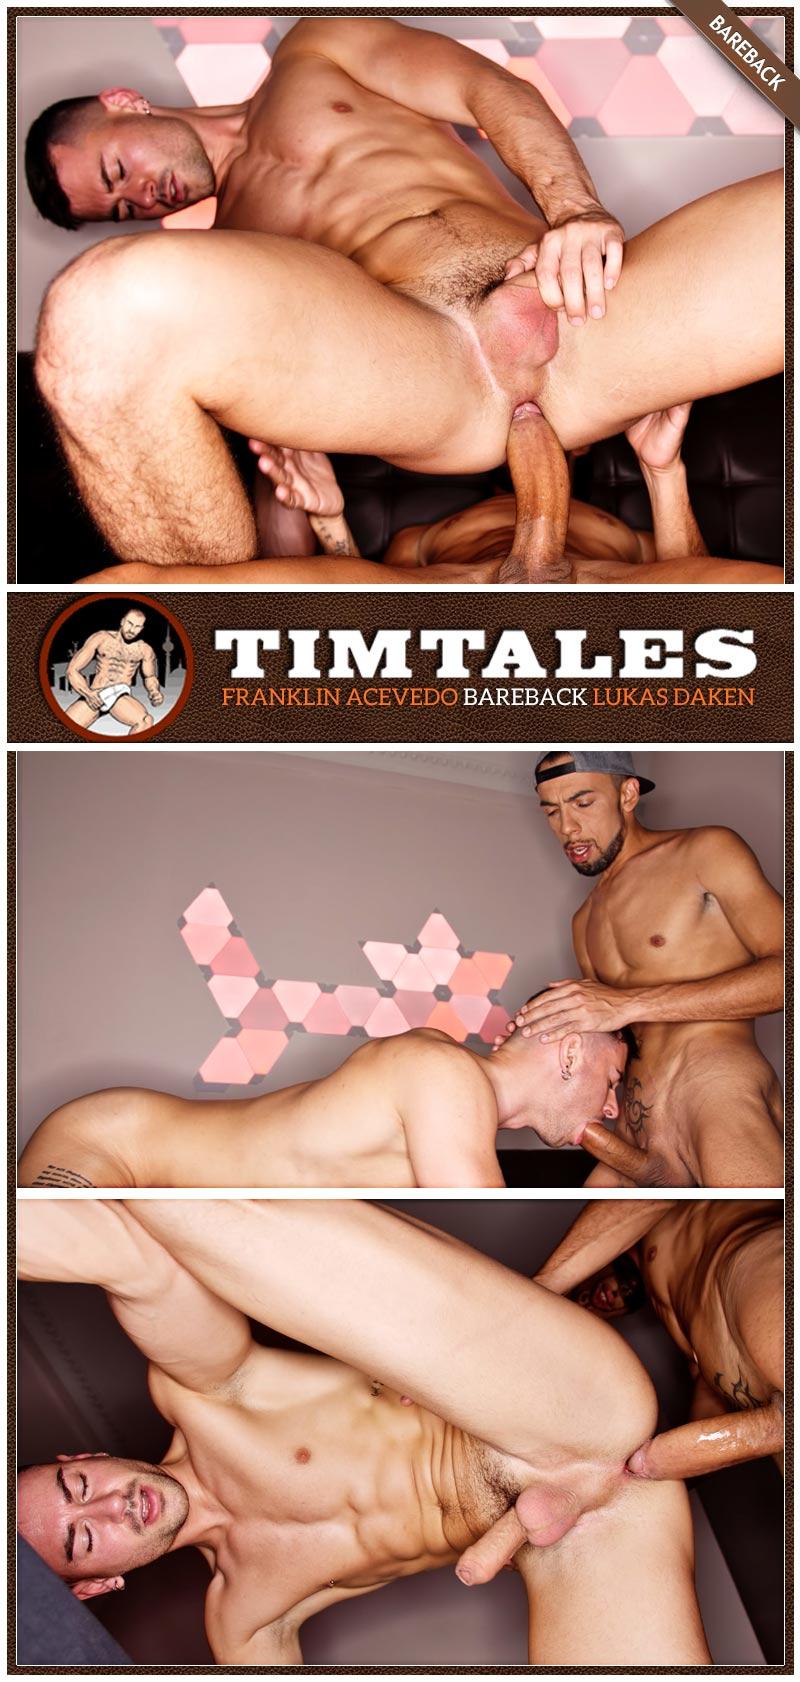 Franklin Acevedo Fucks Lukas Daken (Bareback) at TimTales